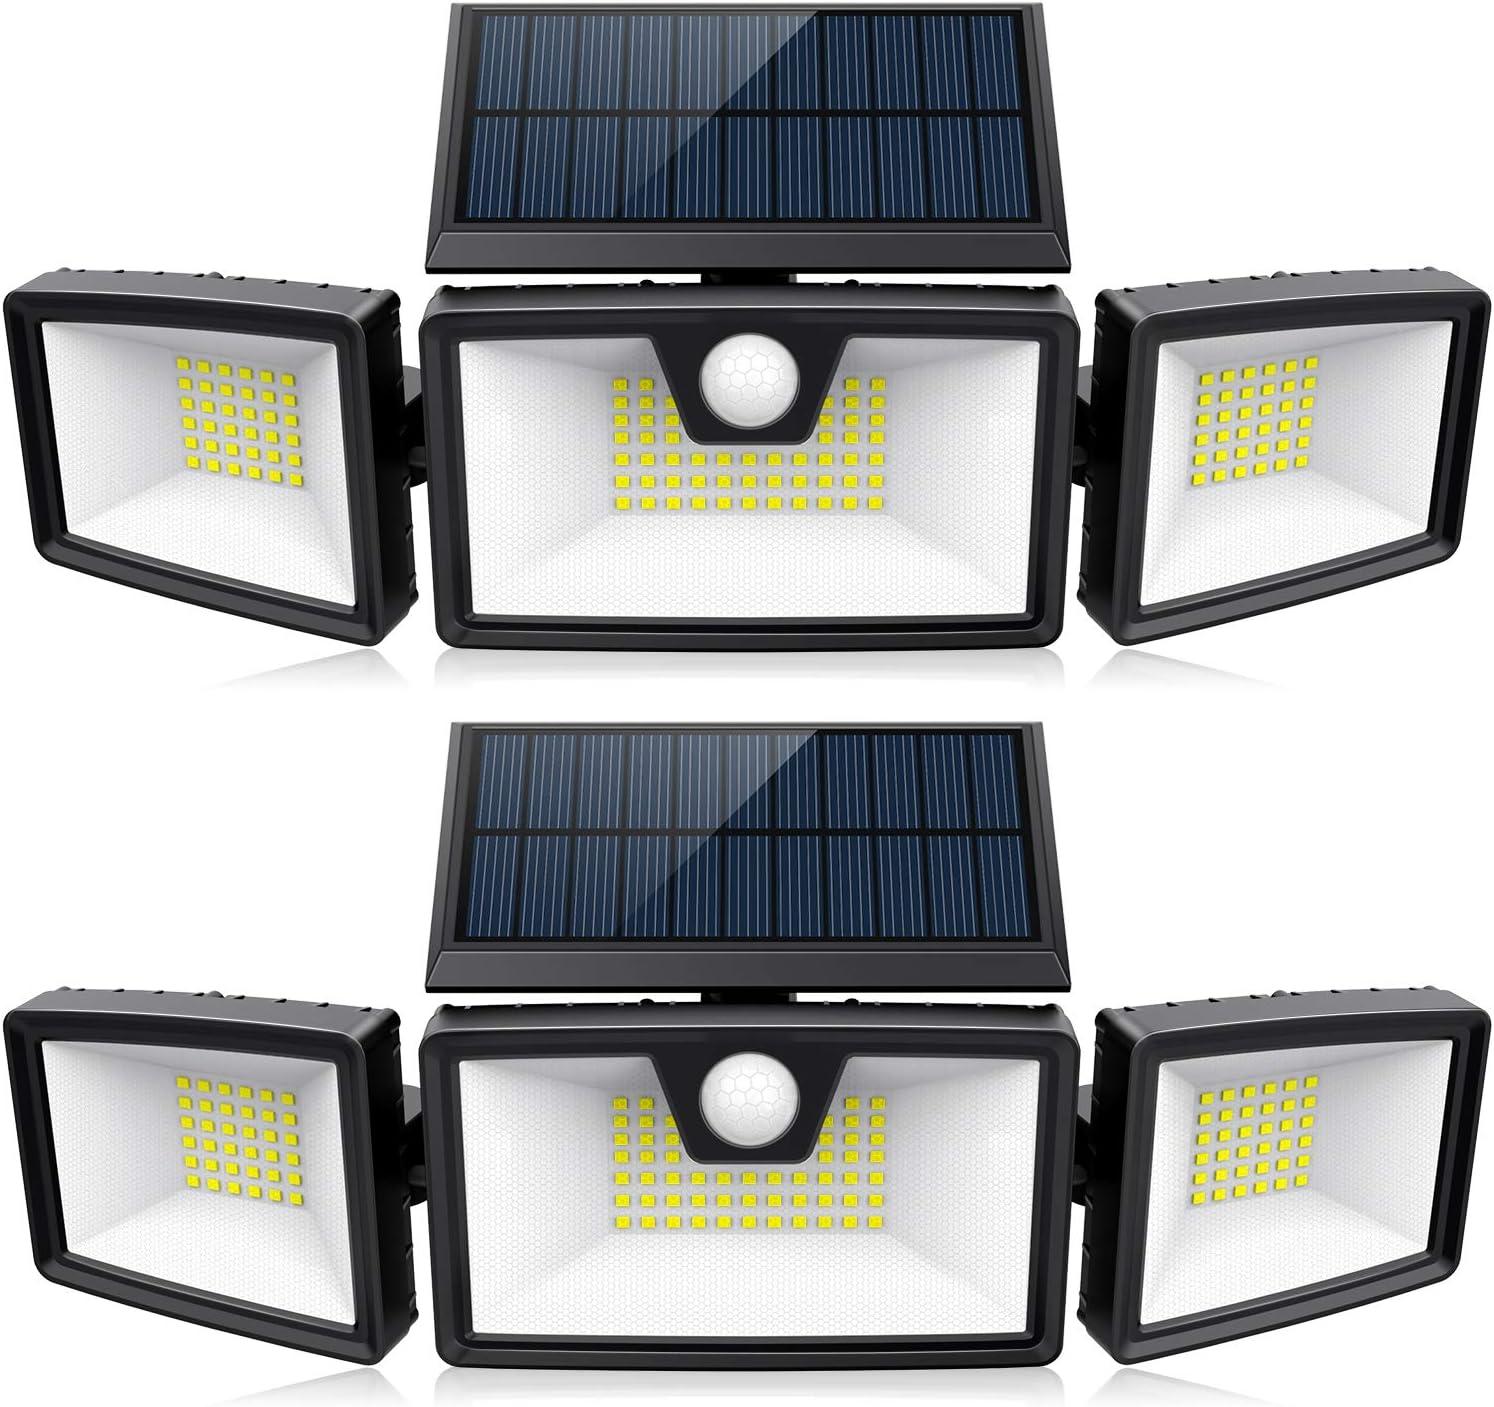 214 LED Solar Motion Sensor Lights Outdoor w/ 3 Work Modes, 3 Adjustable Heads, Wider Lighting Range. Waterproof Security Solar Powered Flood Lights for Outside Wall Yard Garage Porch(1200LM, 2 Pack)